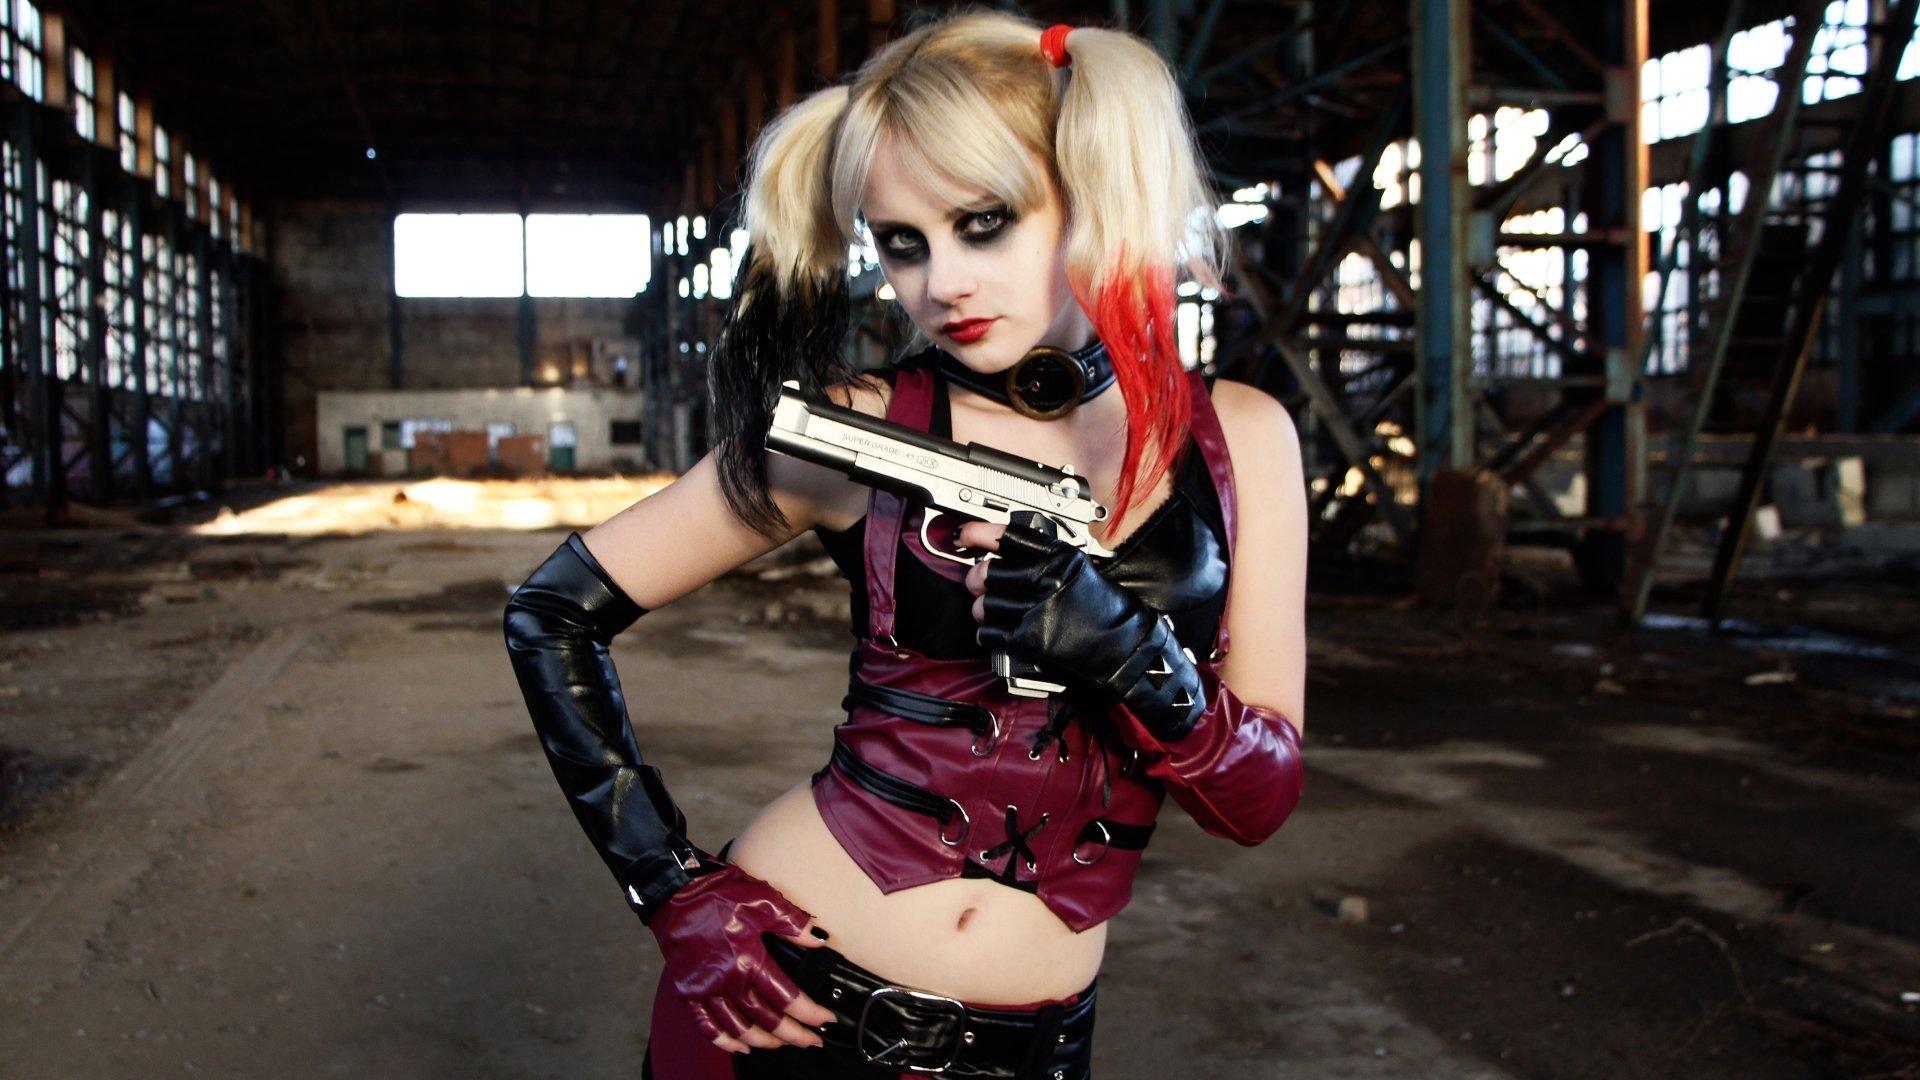 Cosplay Pubg Girl Hd Wallpaper: Harley Quinn 4k Ultra HD Wallpaper And Background Image